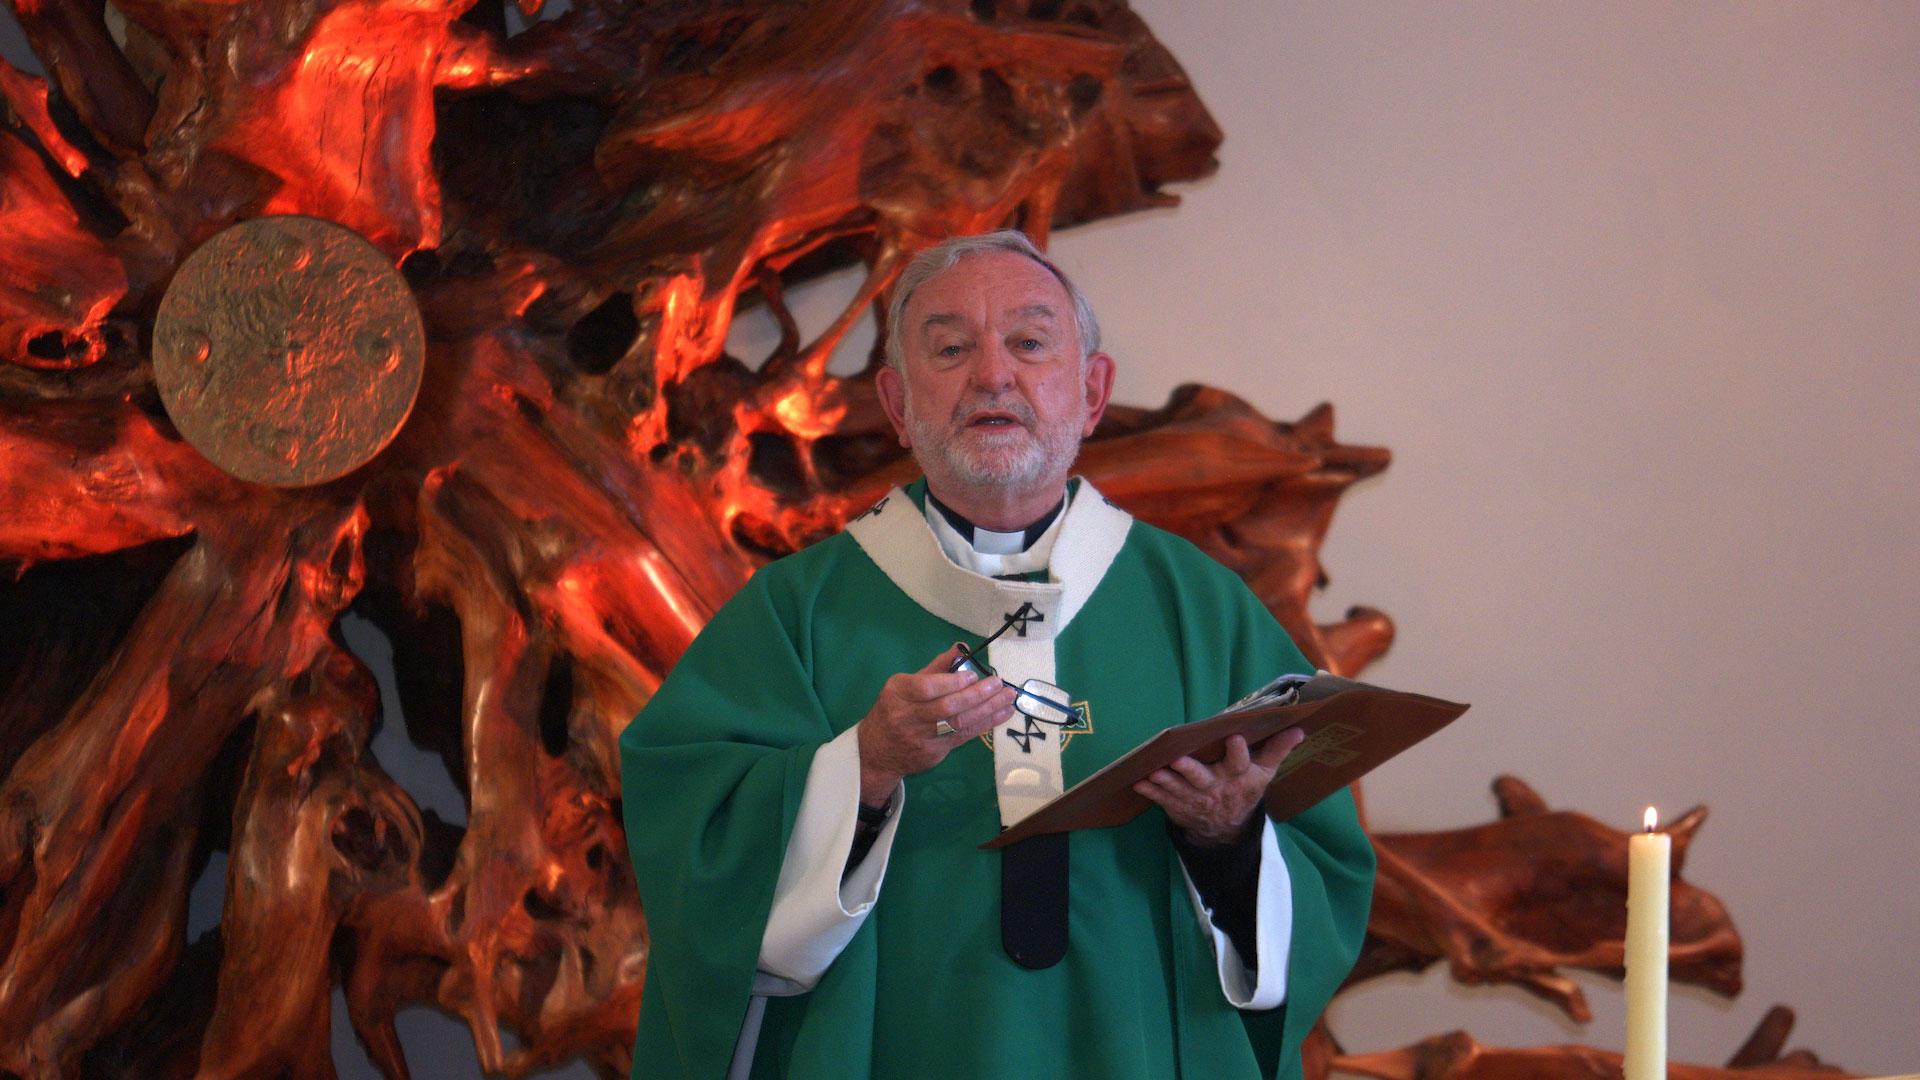 We must develop a listening ear – Archbishop Kieran O'Reilly